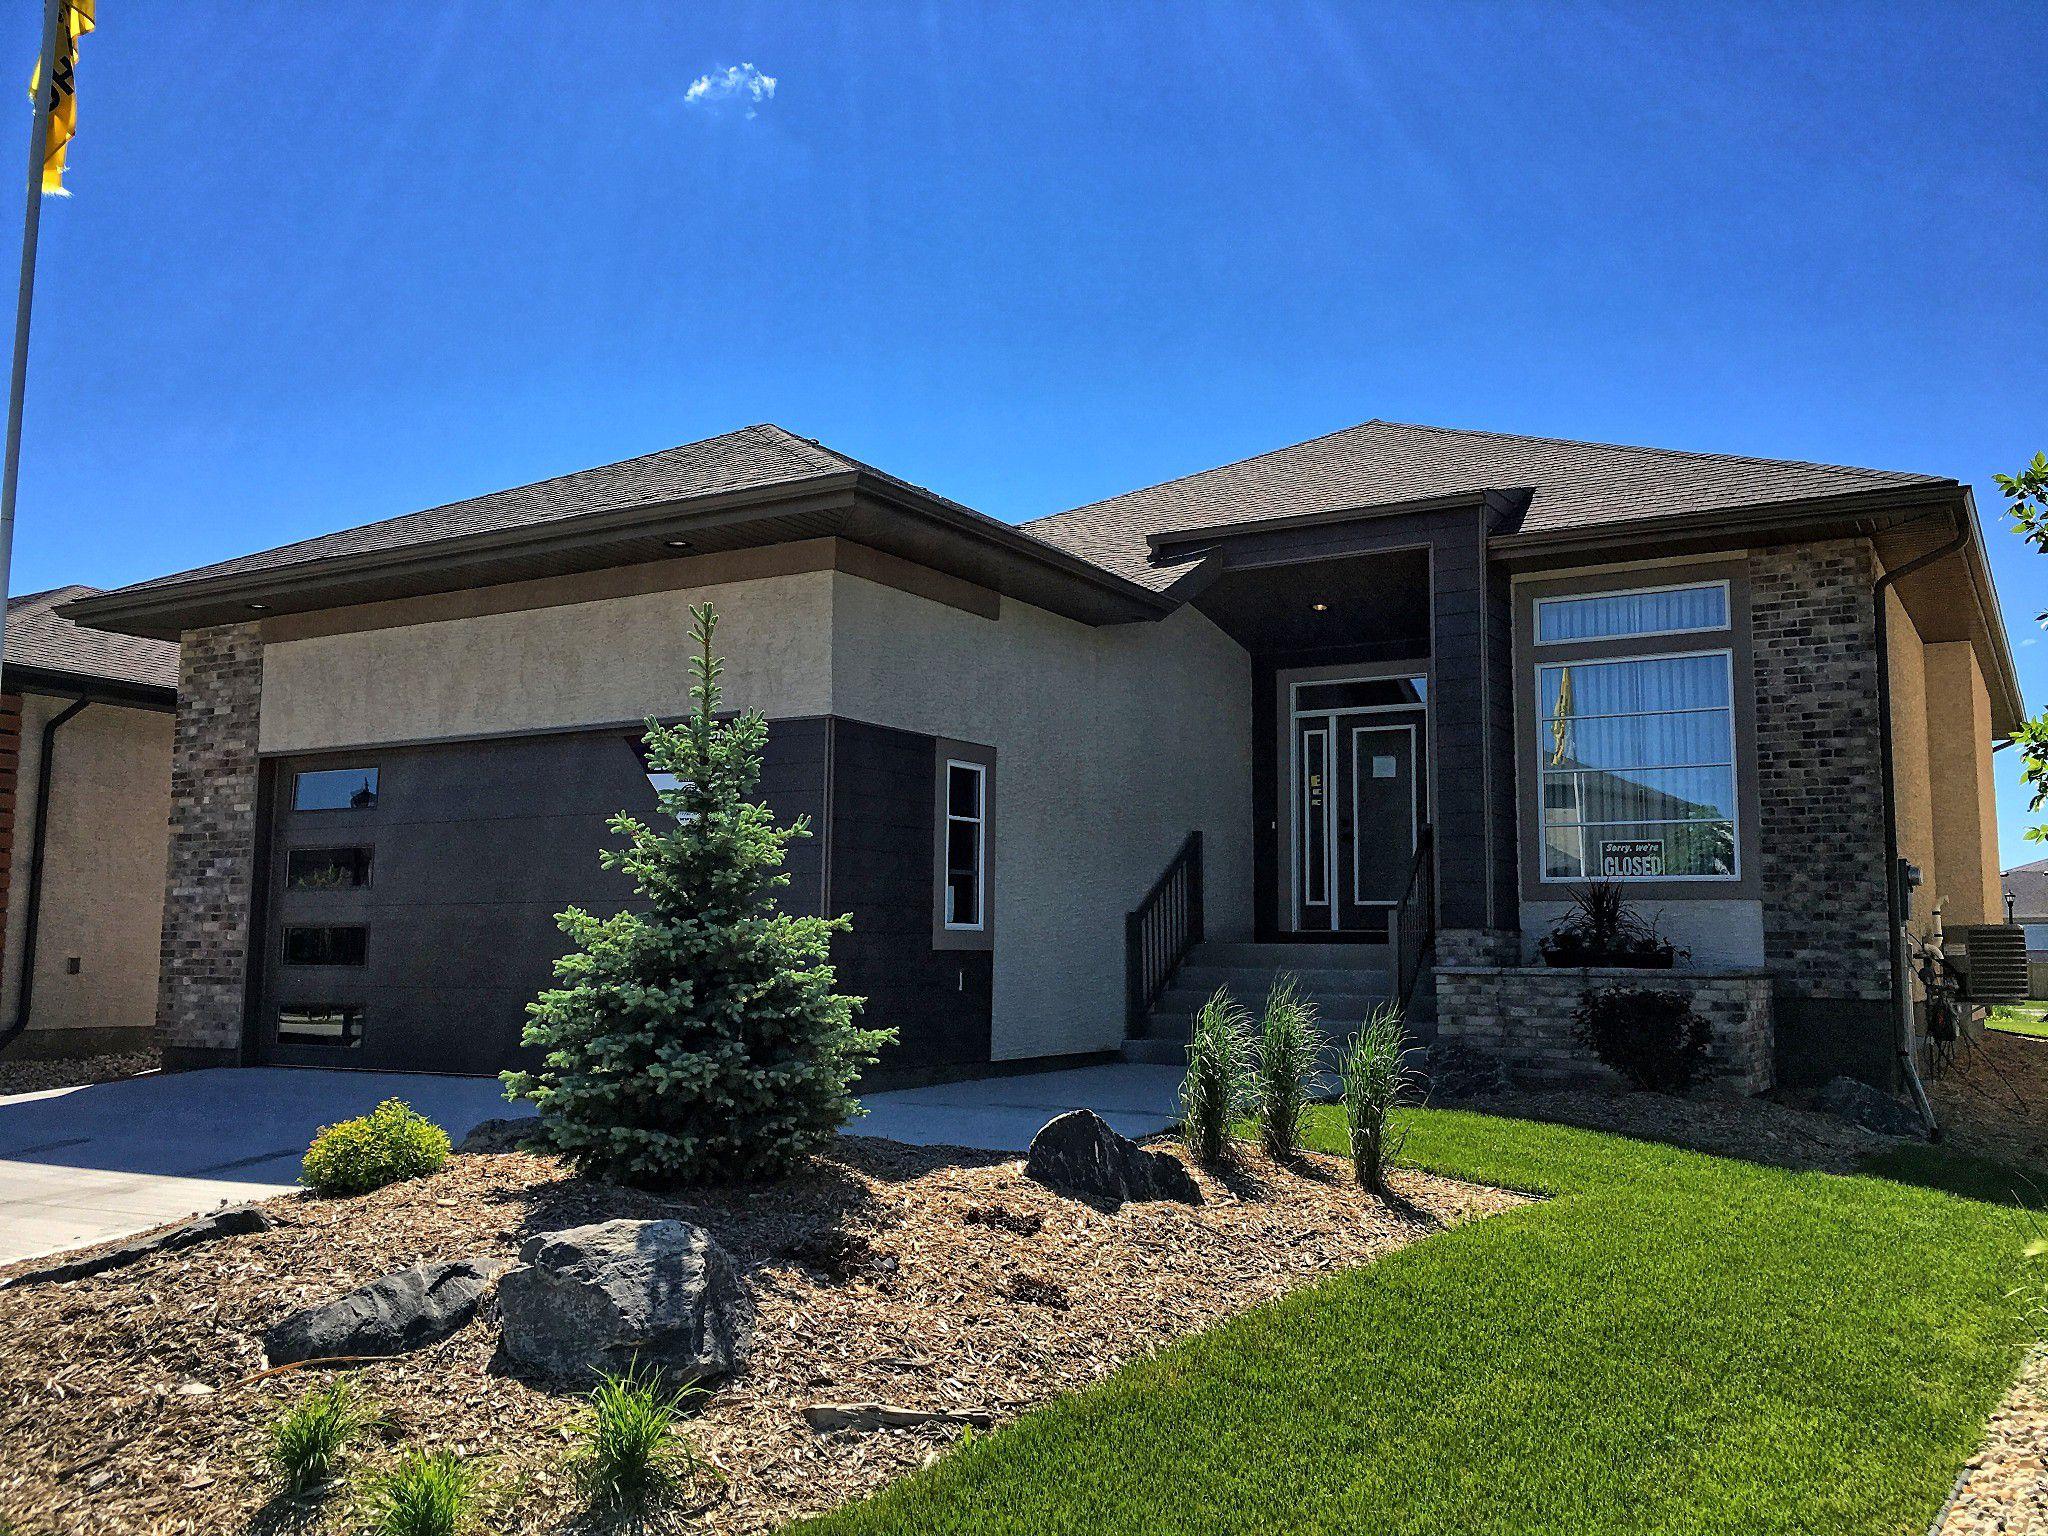 Main Photo: 10 East Plains Drive in Winnipeg: Sage Creek Single Family Detached for sale (2K)